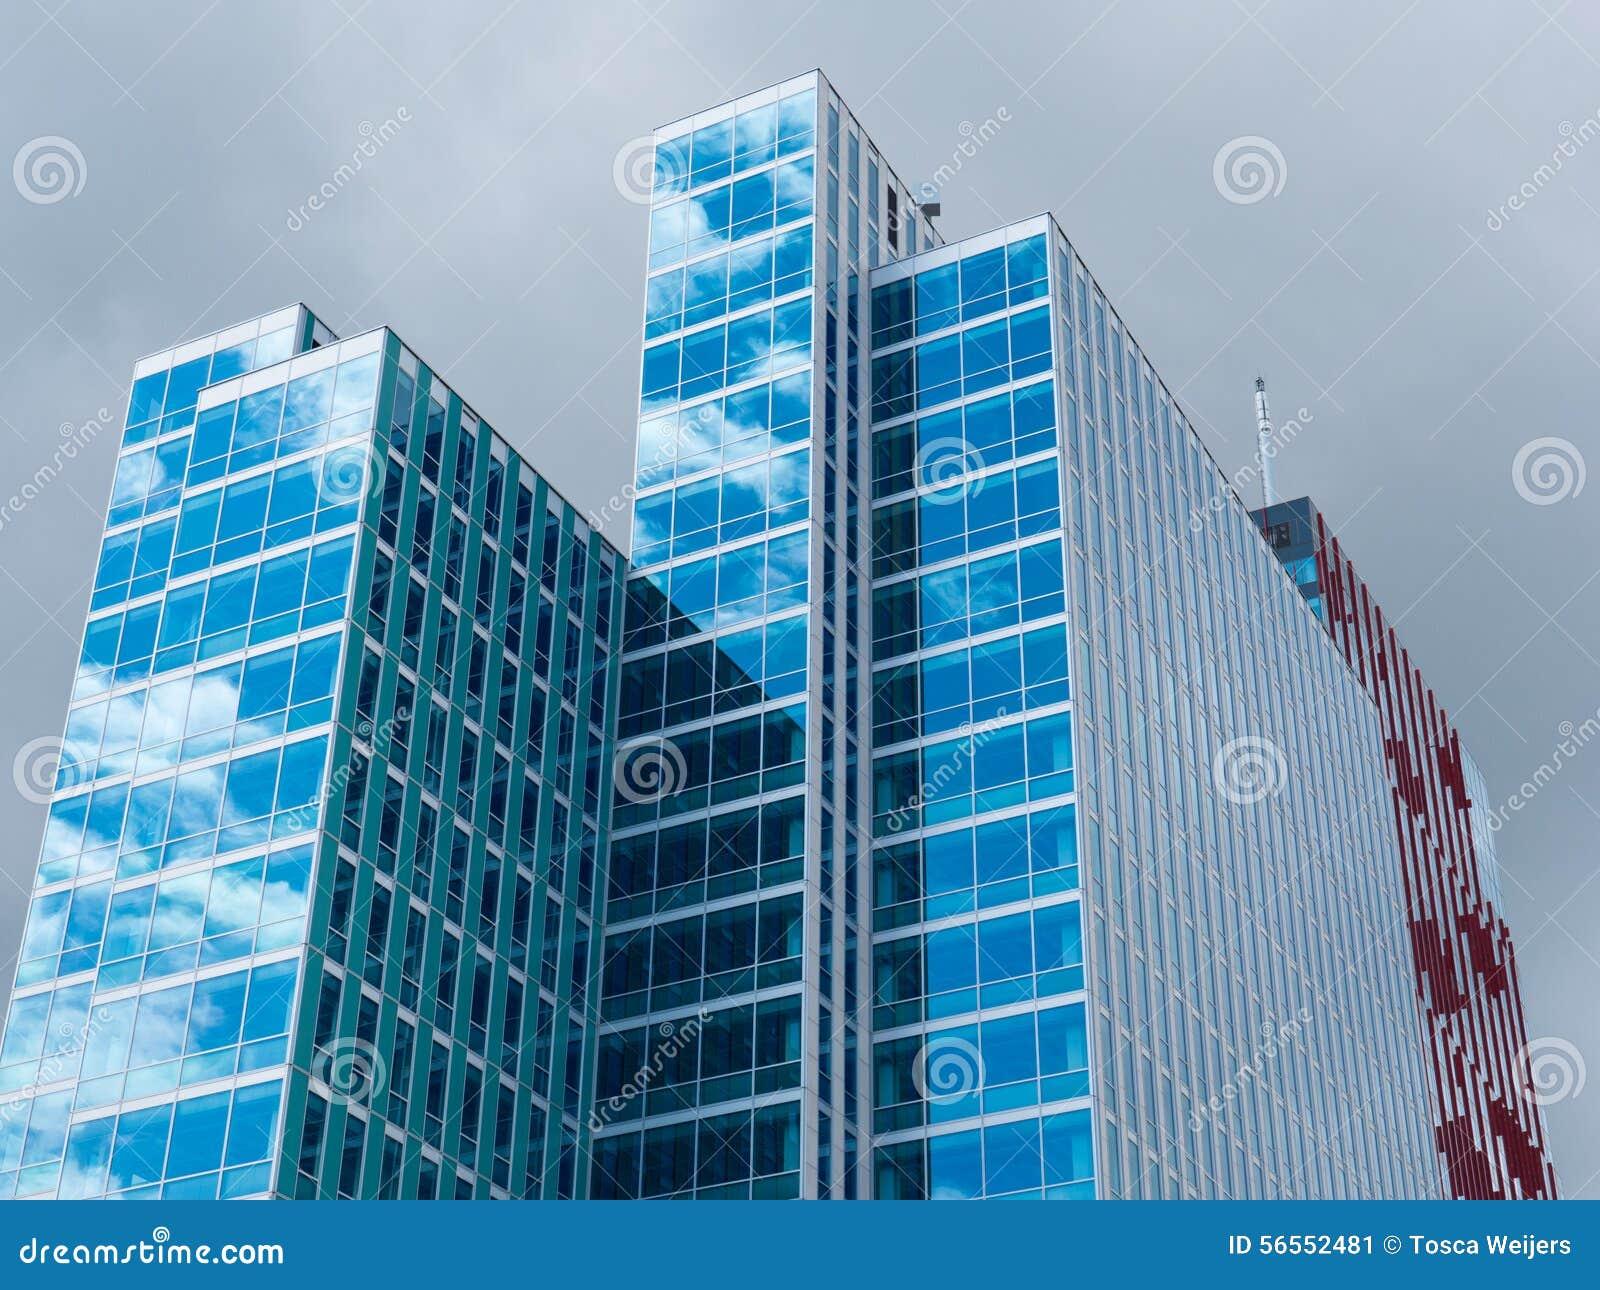 Download χτίζοντας υψηλή άνοδος στοκ εικόνα. εικόνα από κατασκευή - 56552481